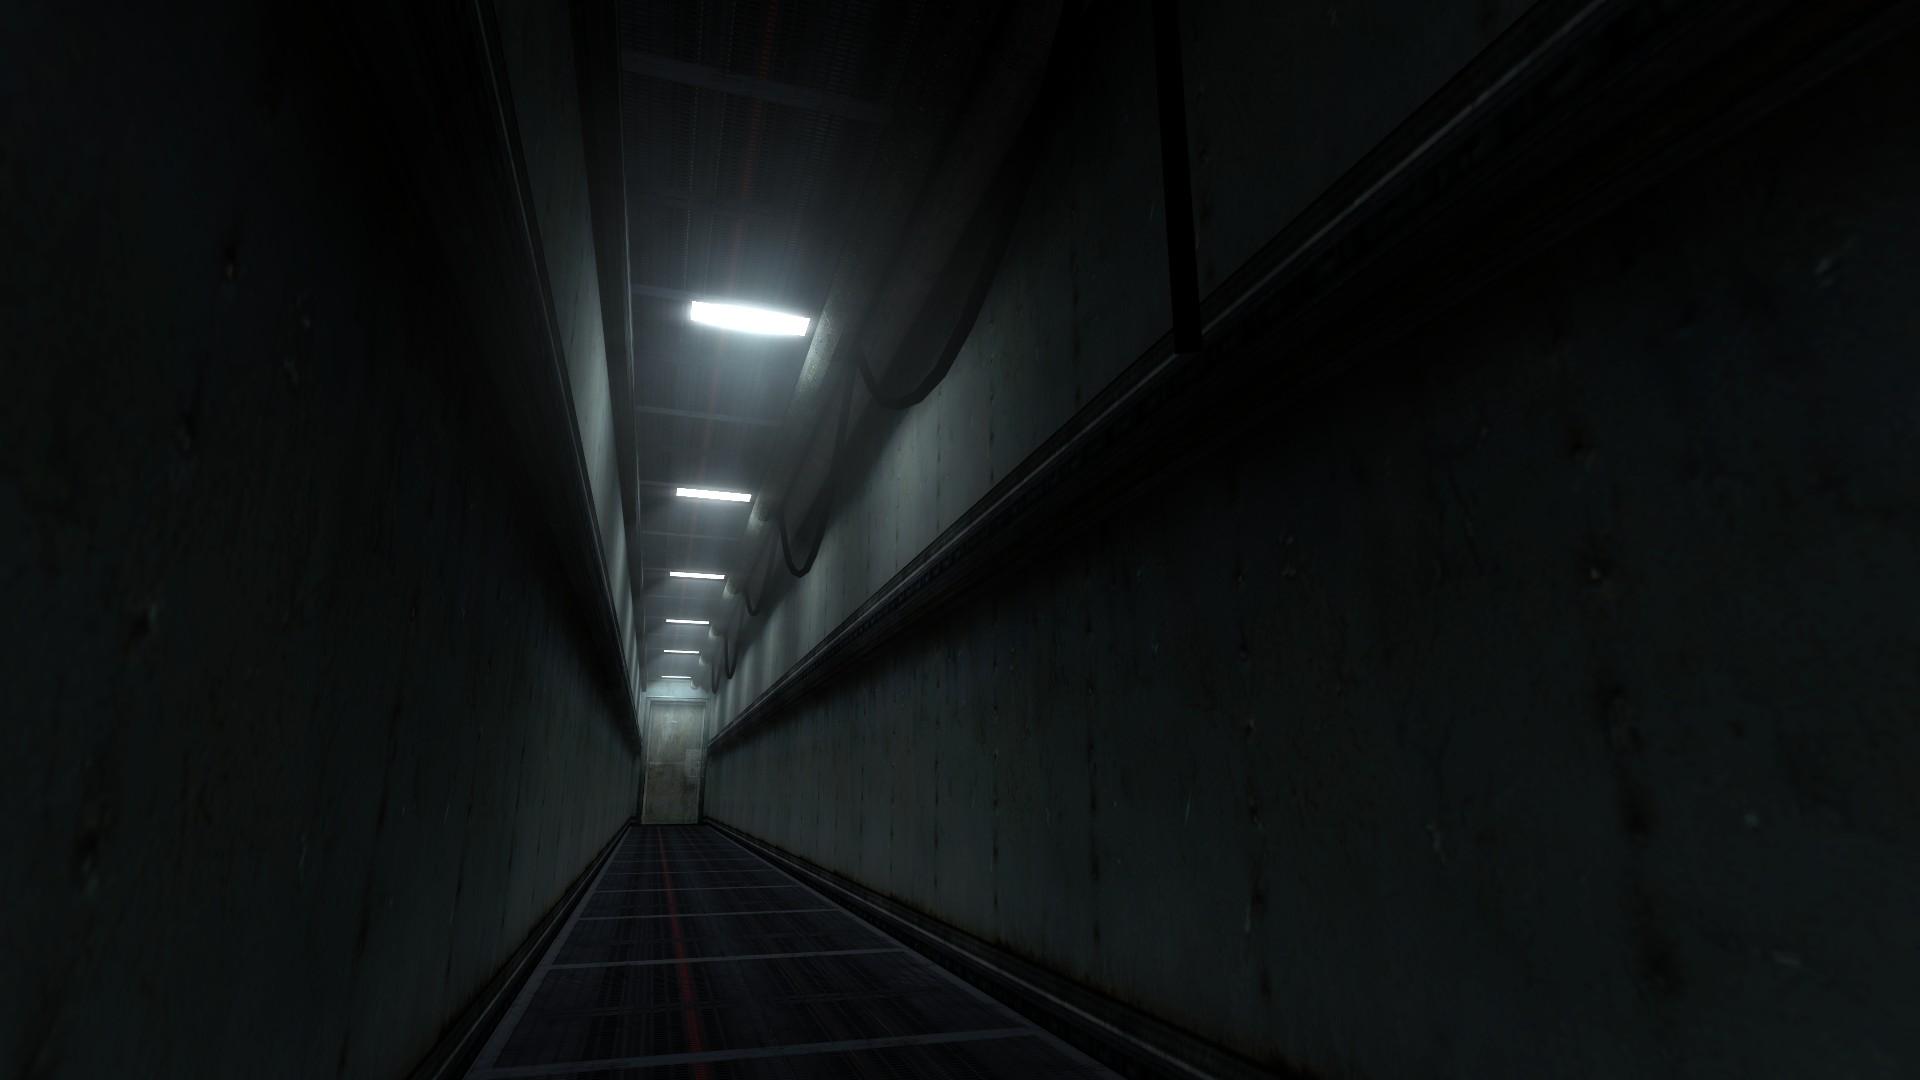 Dark corridor image hiyougami mod db - Wallpaper corridor ...